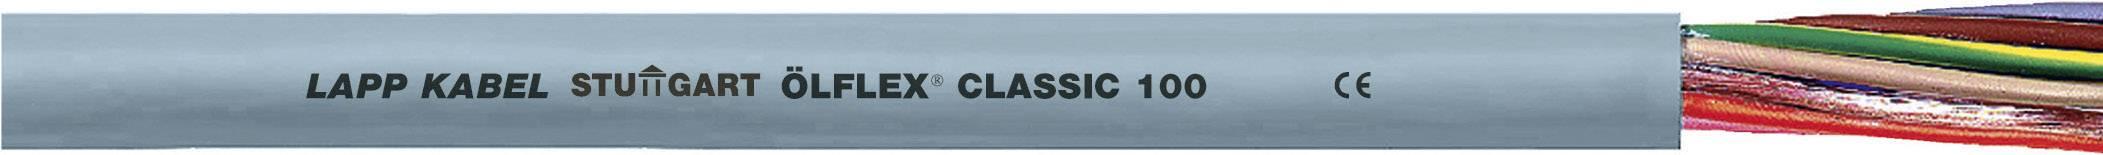 Kabel LappKabel Ölflex CLASSIC 100 5G10 (00101103), PVC, 19,7 mm, 750 V, šedá, 50 m